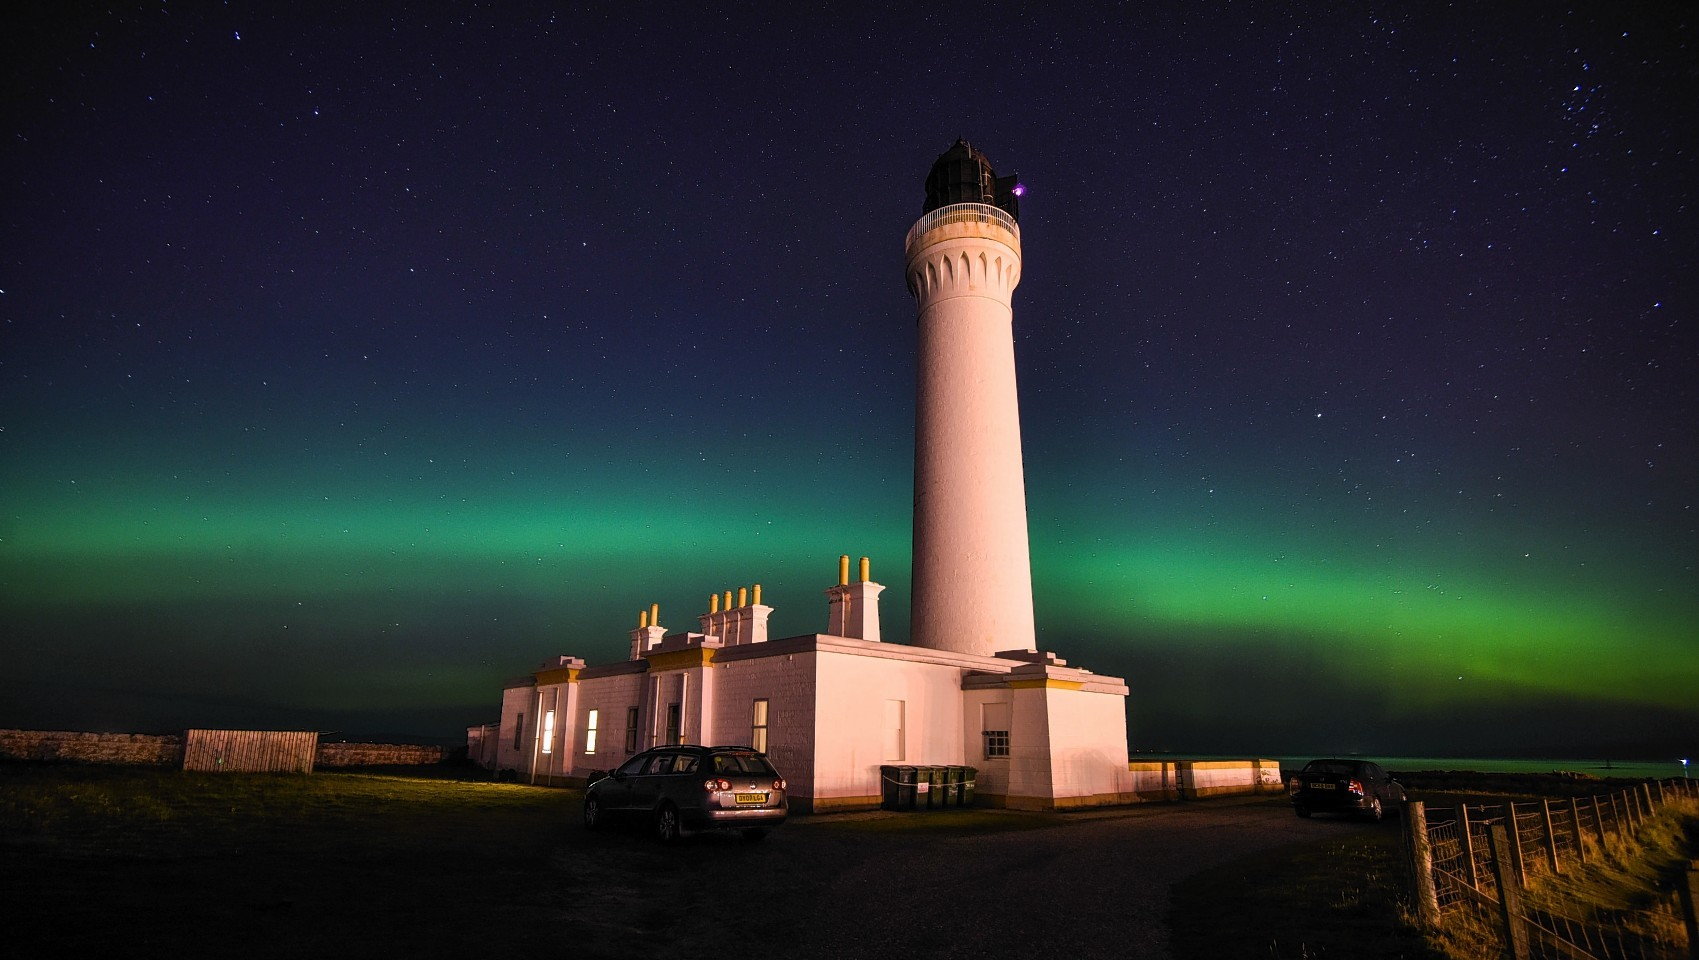 Covesea Lighthouse near Lossiemouth, Moray